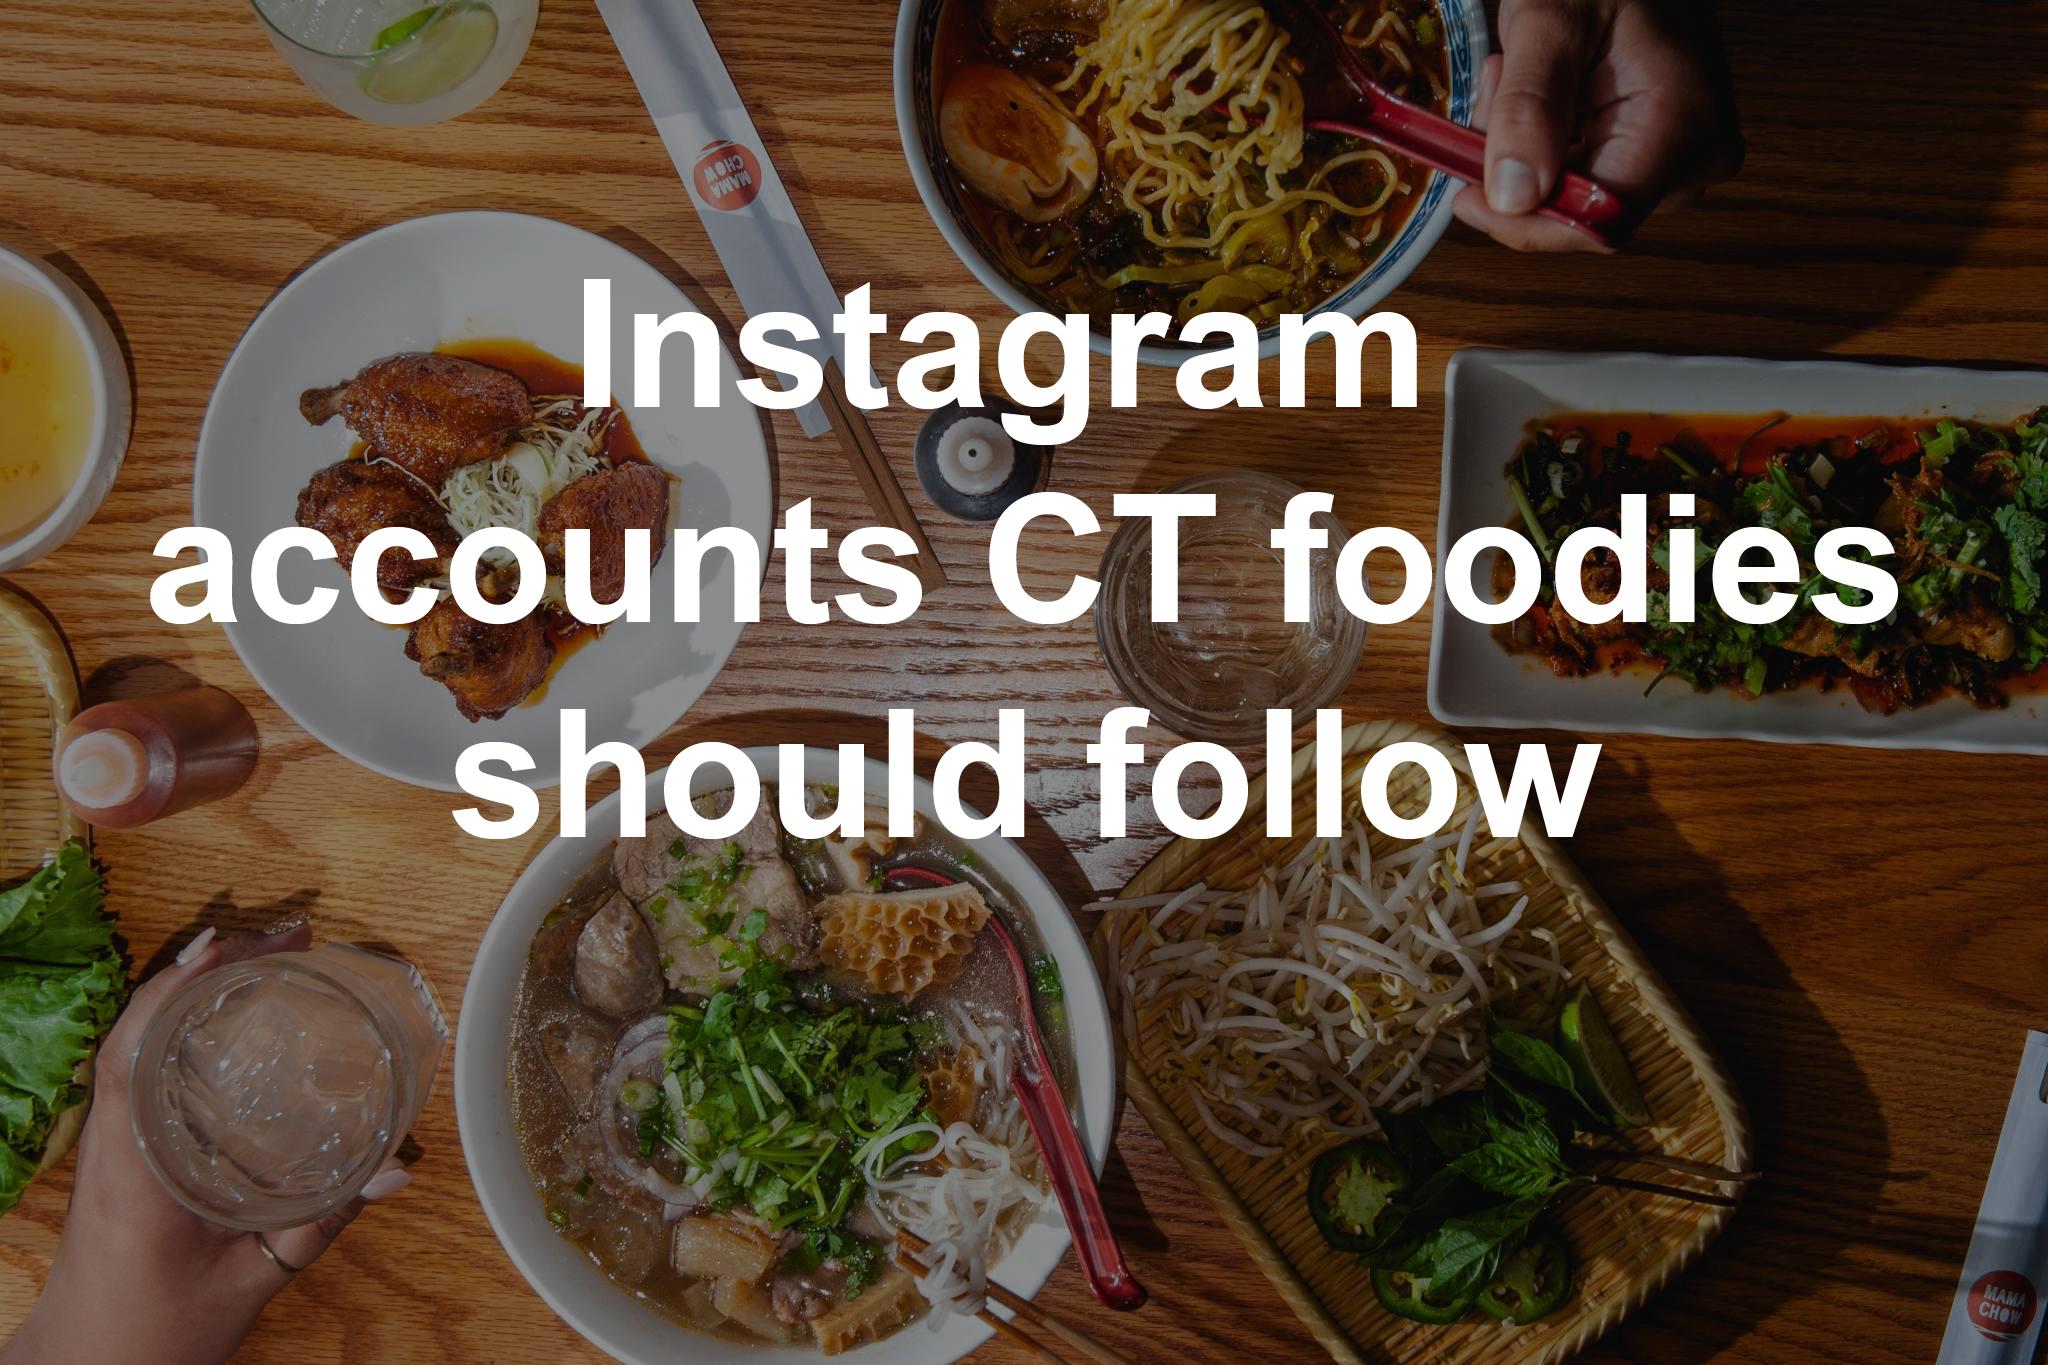 11 Instagram accounts CT foodies should follow